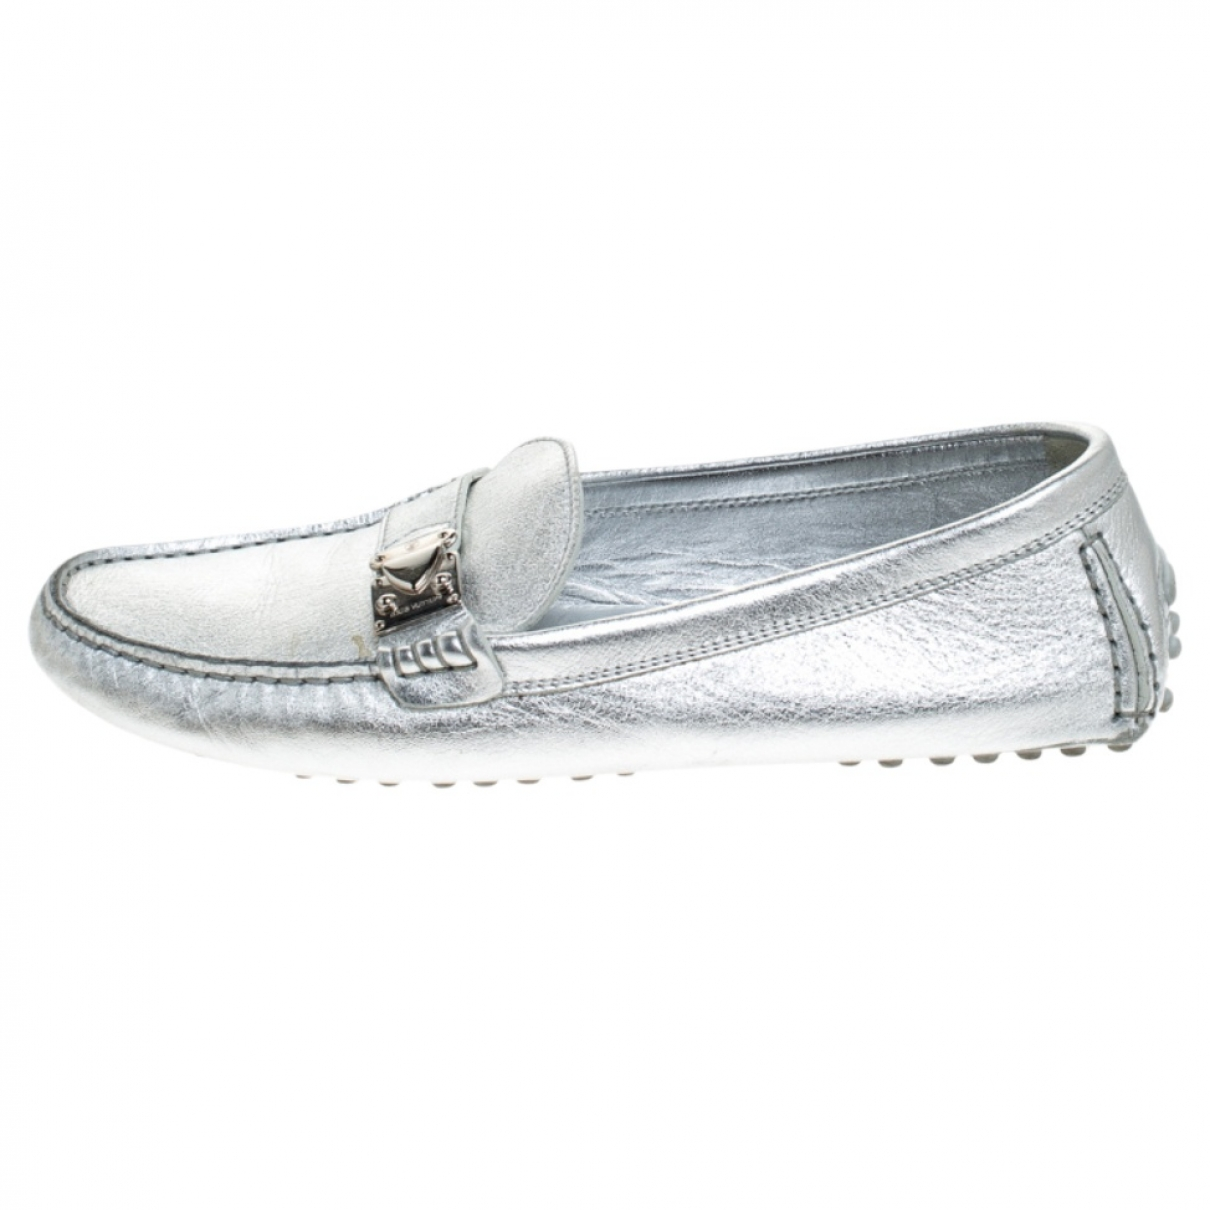 Louis Vuitton Upper Case Silver Leather Flats for Women 37 EU